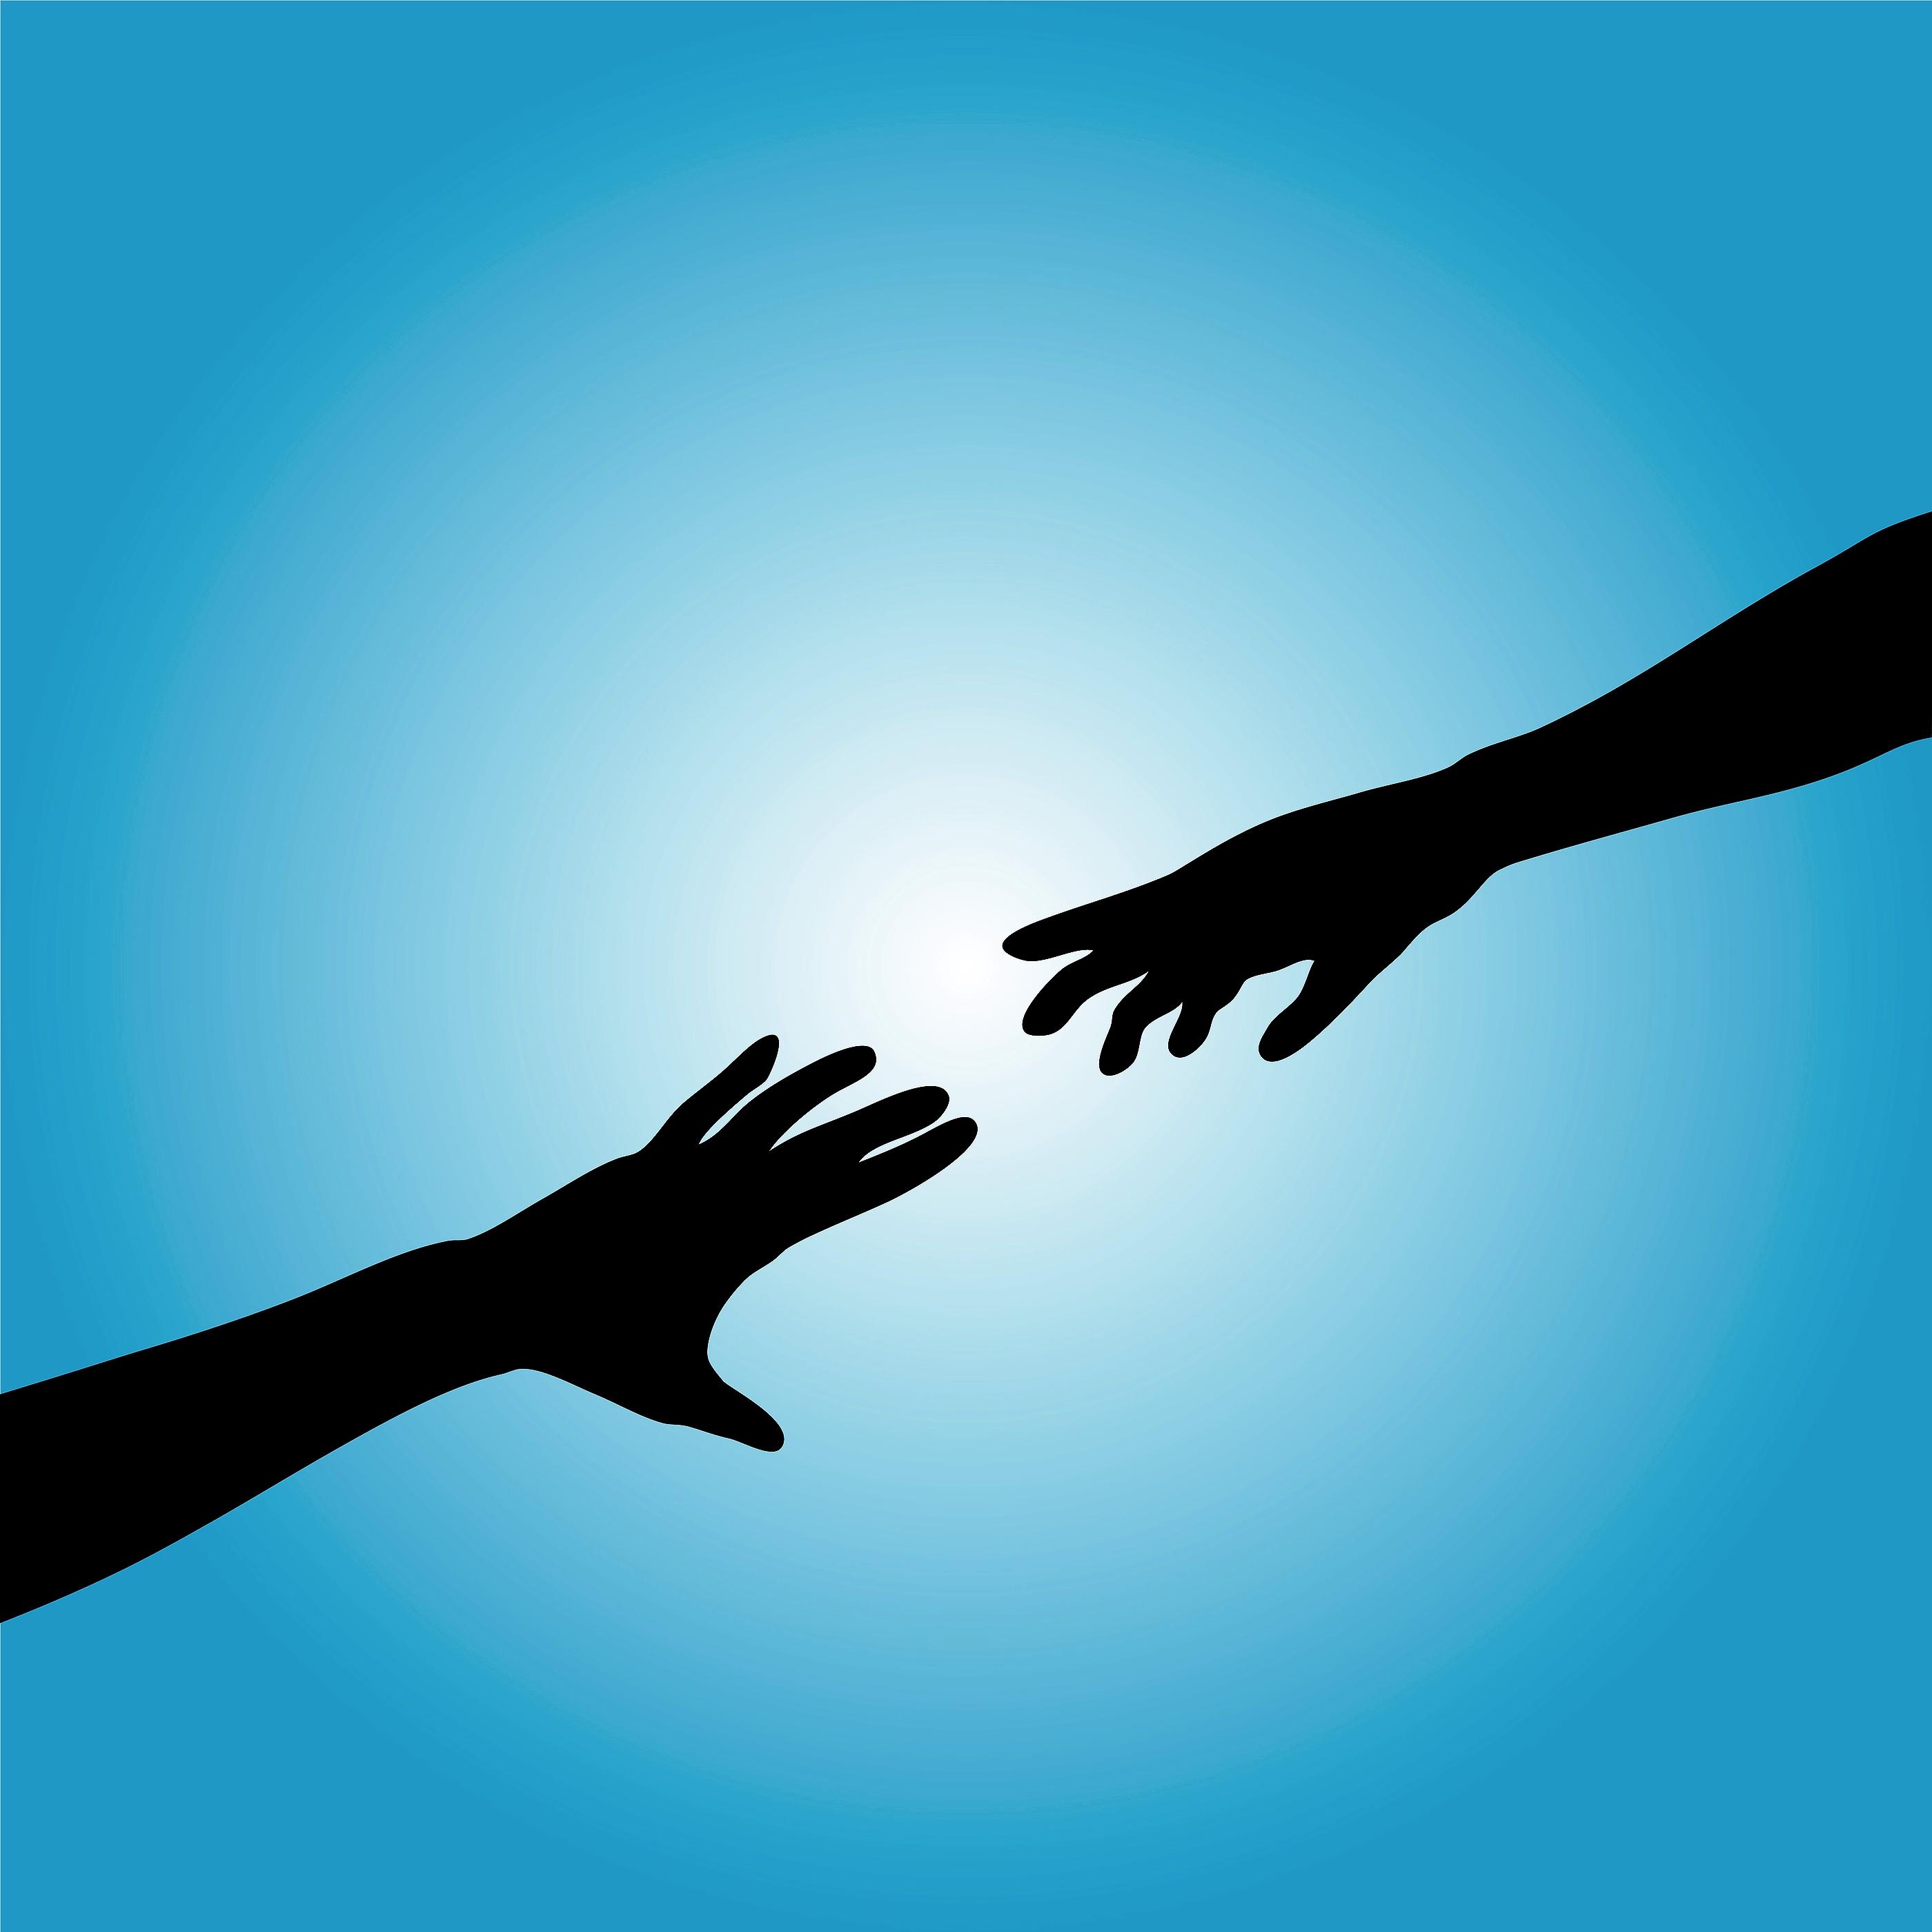 Reaching hand silhouette